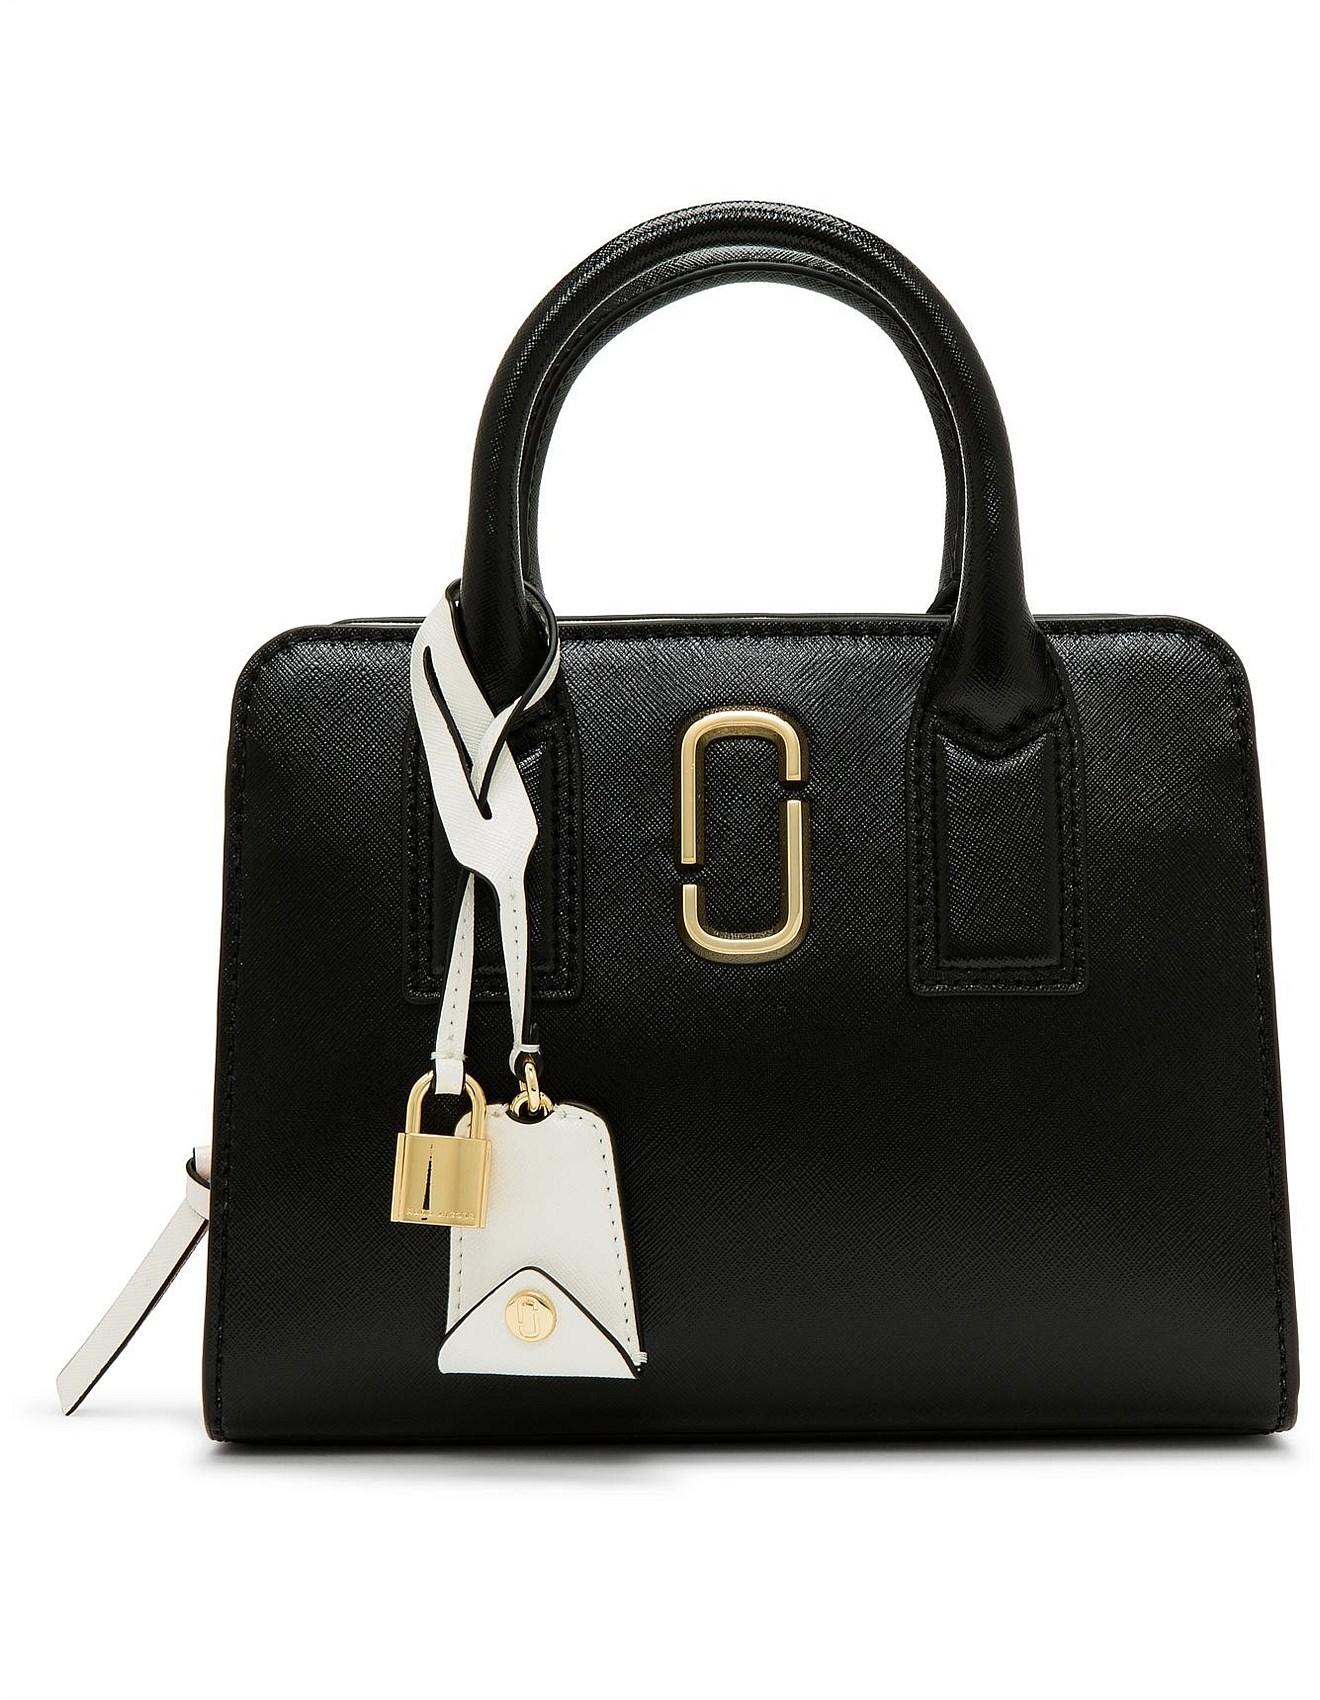 bb4eb5936d2 Bags & Accessories - LITTLE BIG SHOT Tote Bag